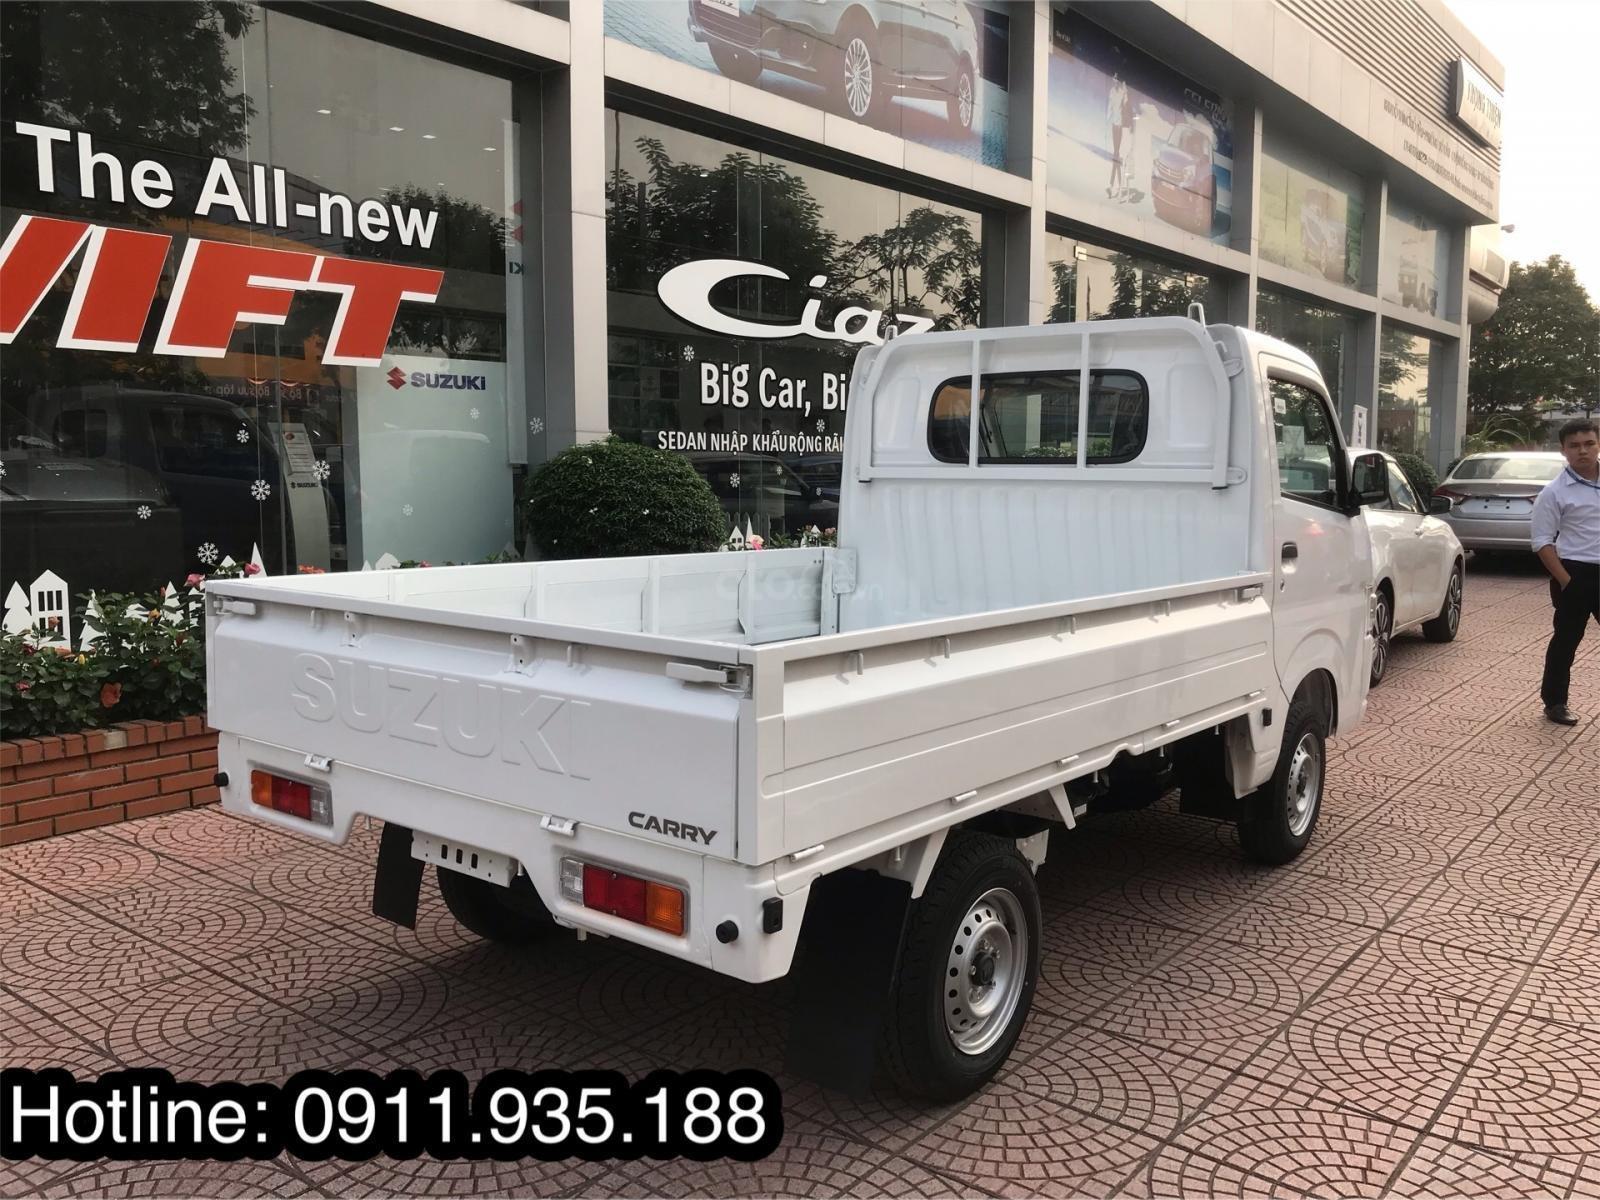 Bán Suzuki Pro 810kg mới 100%, màu trắng, 234tr, LH 0911.935.188 (6)